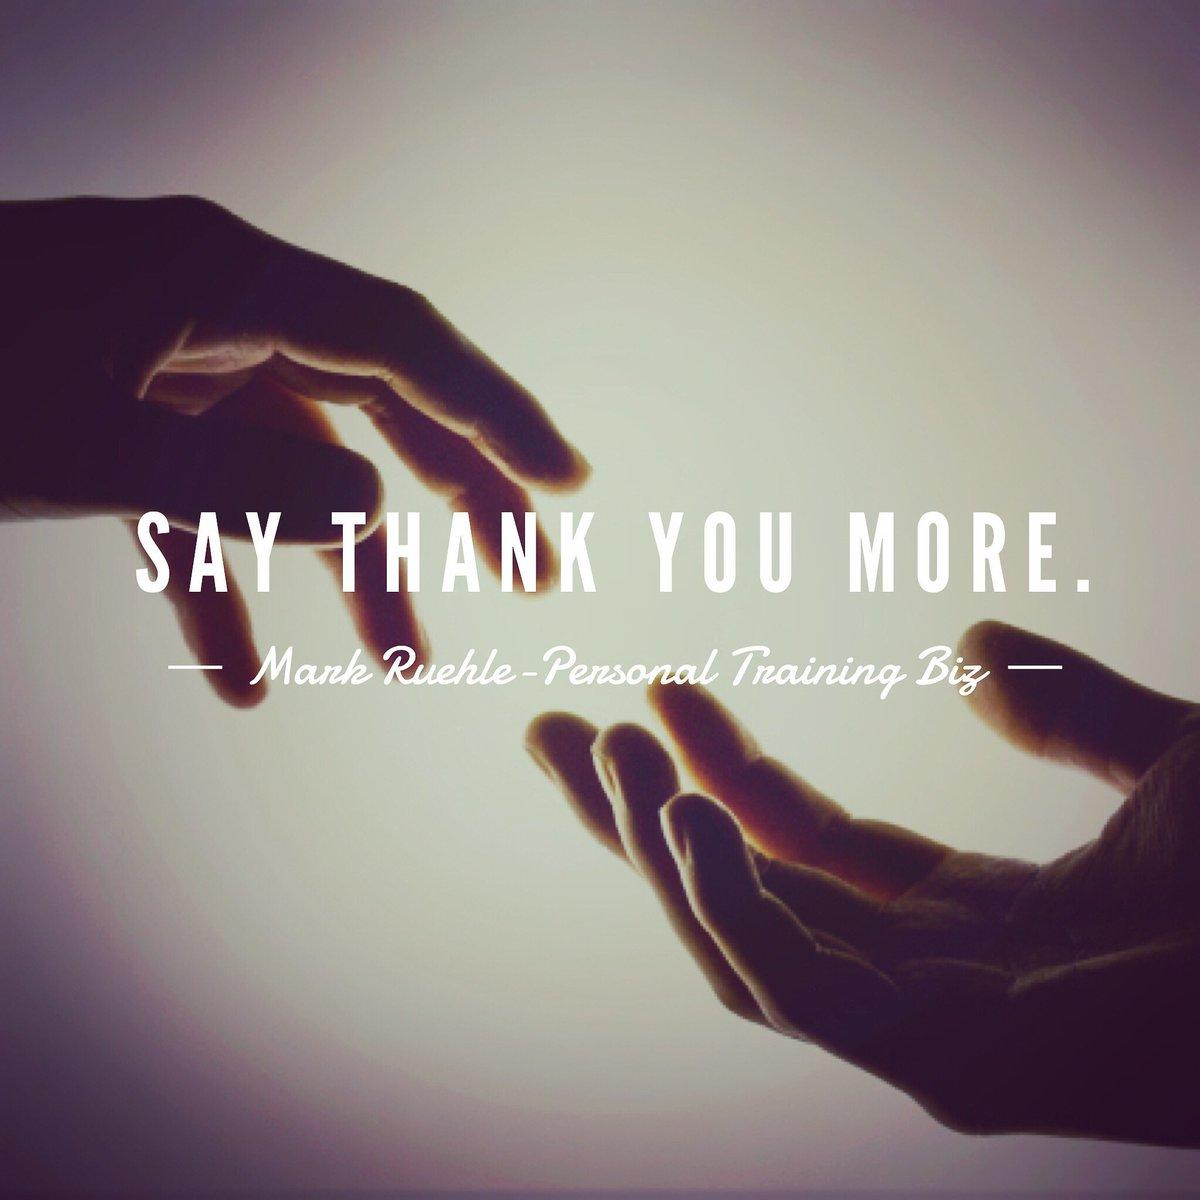 It's a POWERFUL FEELING when u tell someone how much u appreciate them. #grateful #thankful #personaltrainer #personaltraining #pt #fitfam #fitspo #successquotes #internetmarketing #inspirationalquotes #networkmarketing #networking #socialmediamarketing #onlinemarketing #garyvee